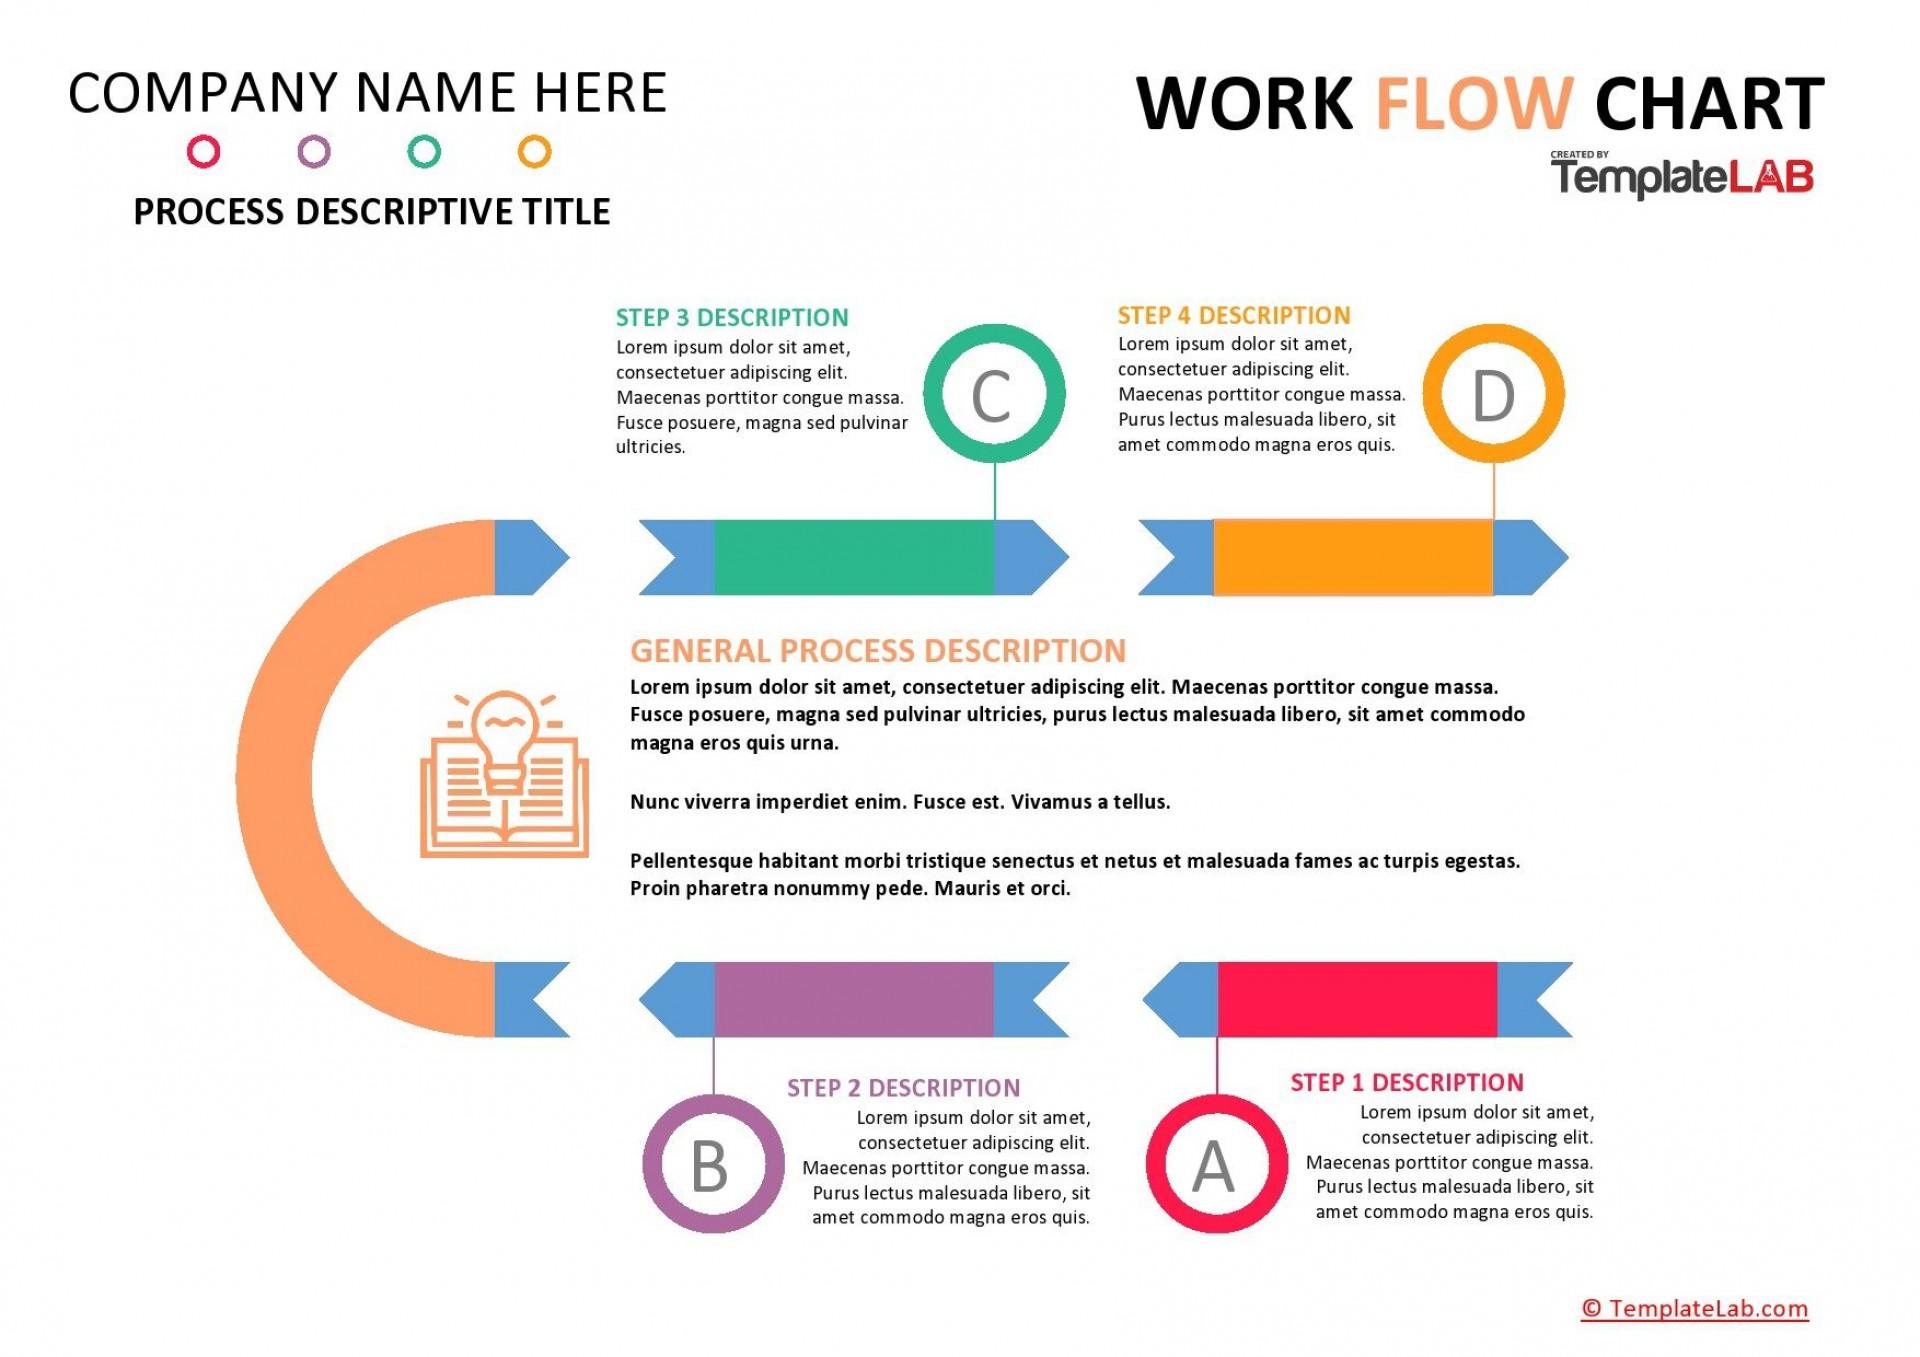 009 Wonderful Proces Flow Chart Template Excel Download Concept  Free1920